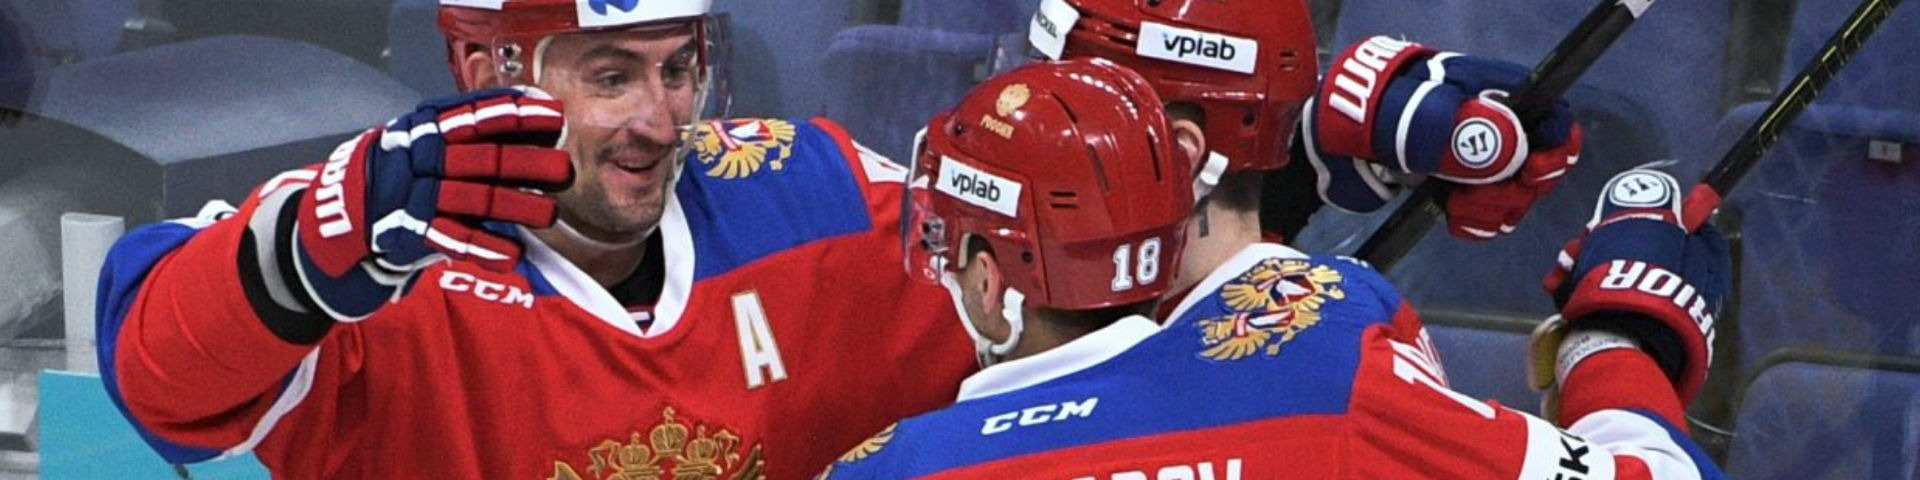 Чехия – Россия– прогноз на 10 ноября, ставки на хоккей